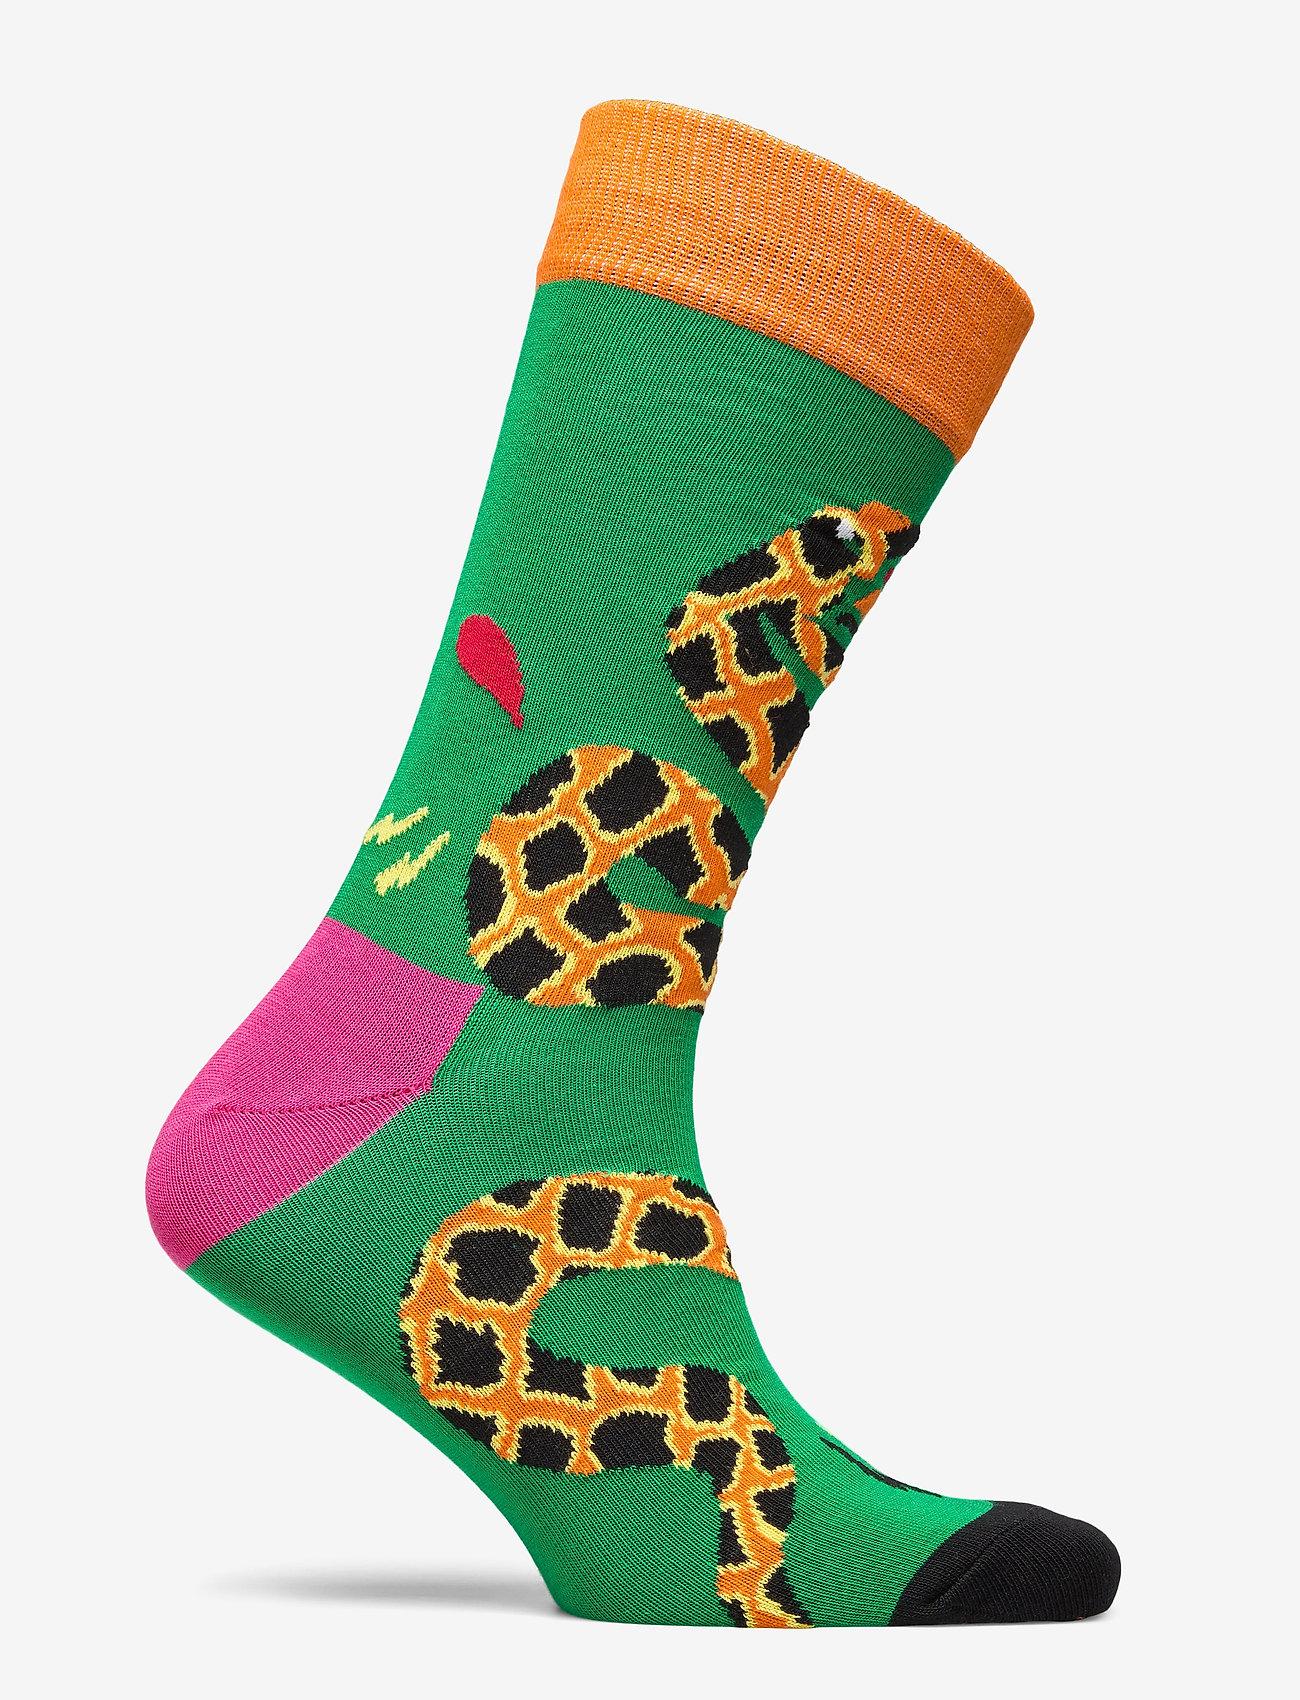 Tropical Snake Sock (Green) (5.97 €) - Happy Socks Mo8vp